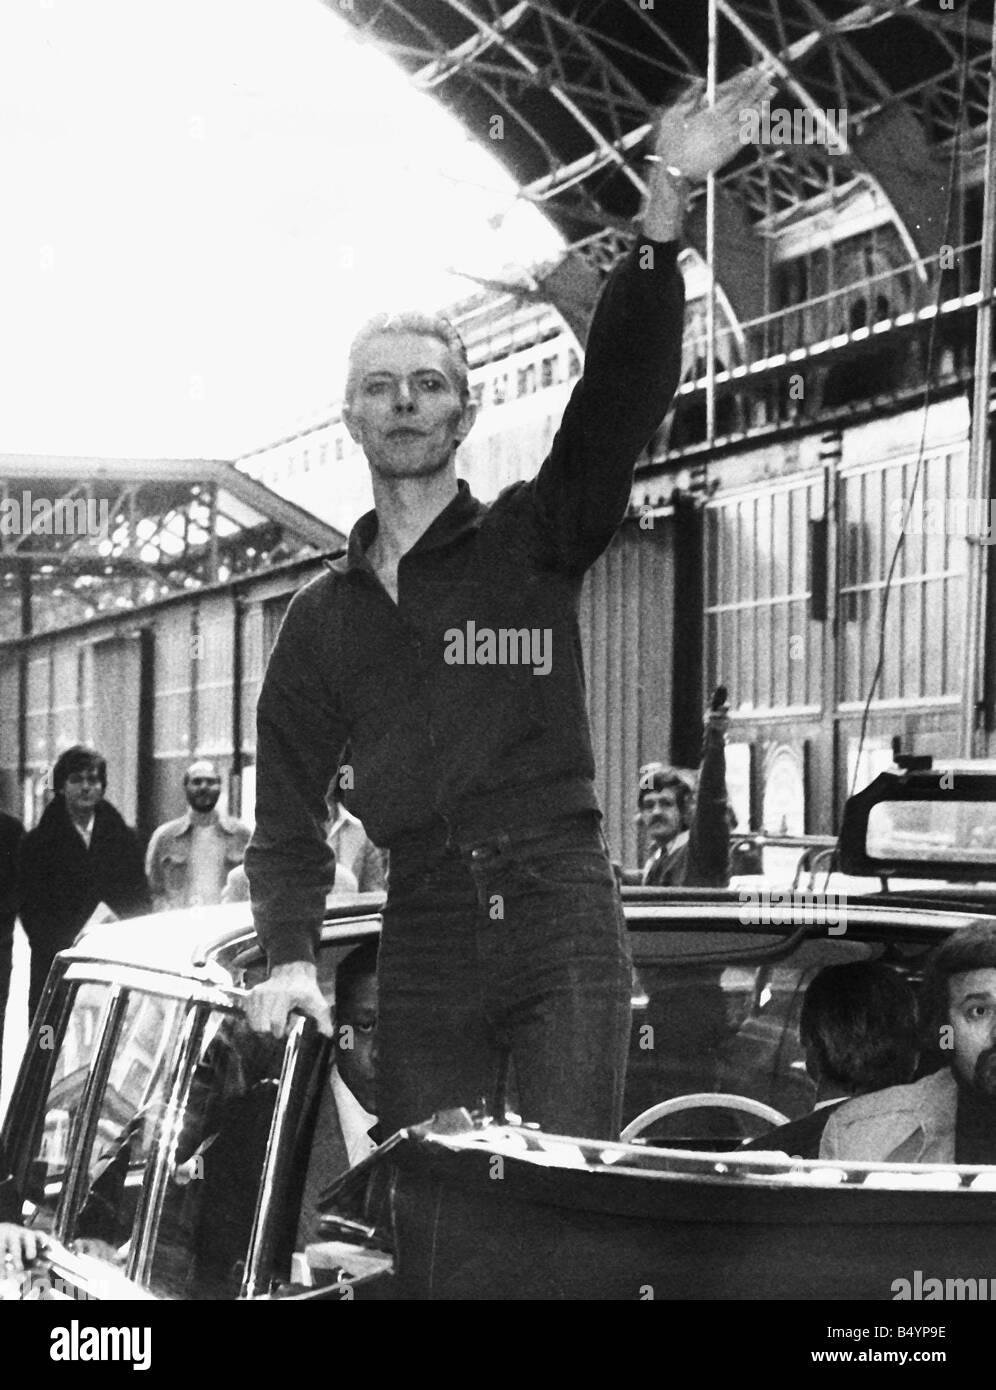 David Bowie pop singer at Victoria Station 1976 gqmagazineusa - Stock Image